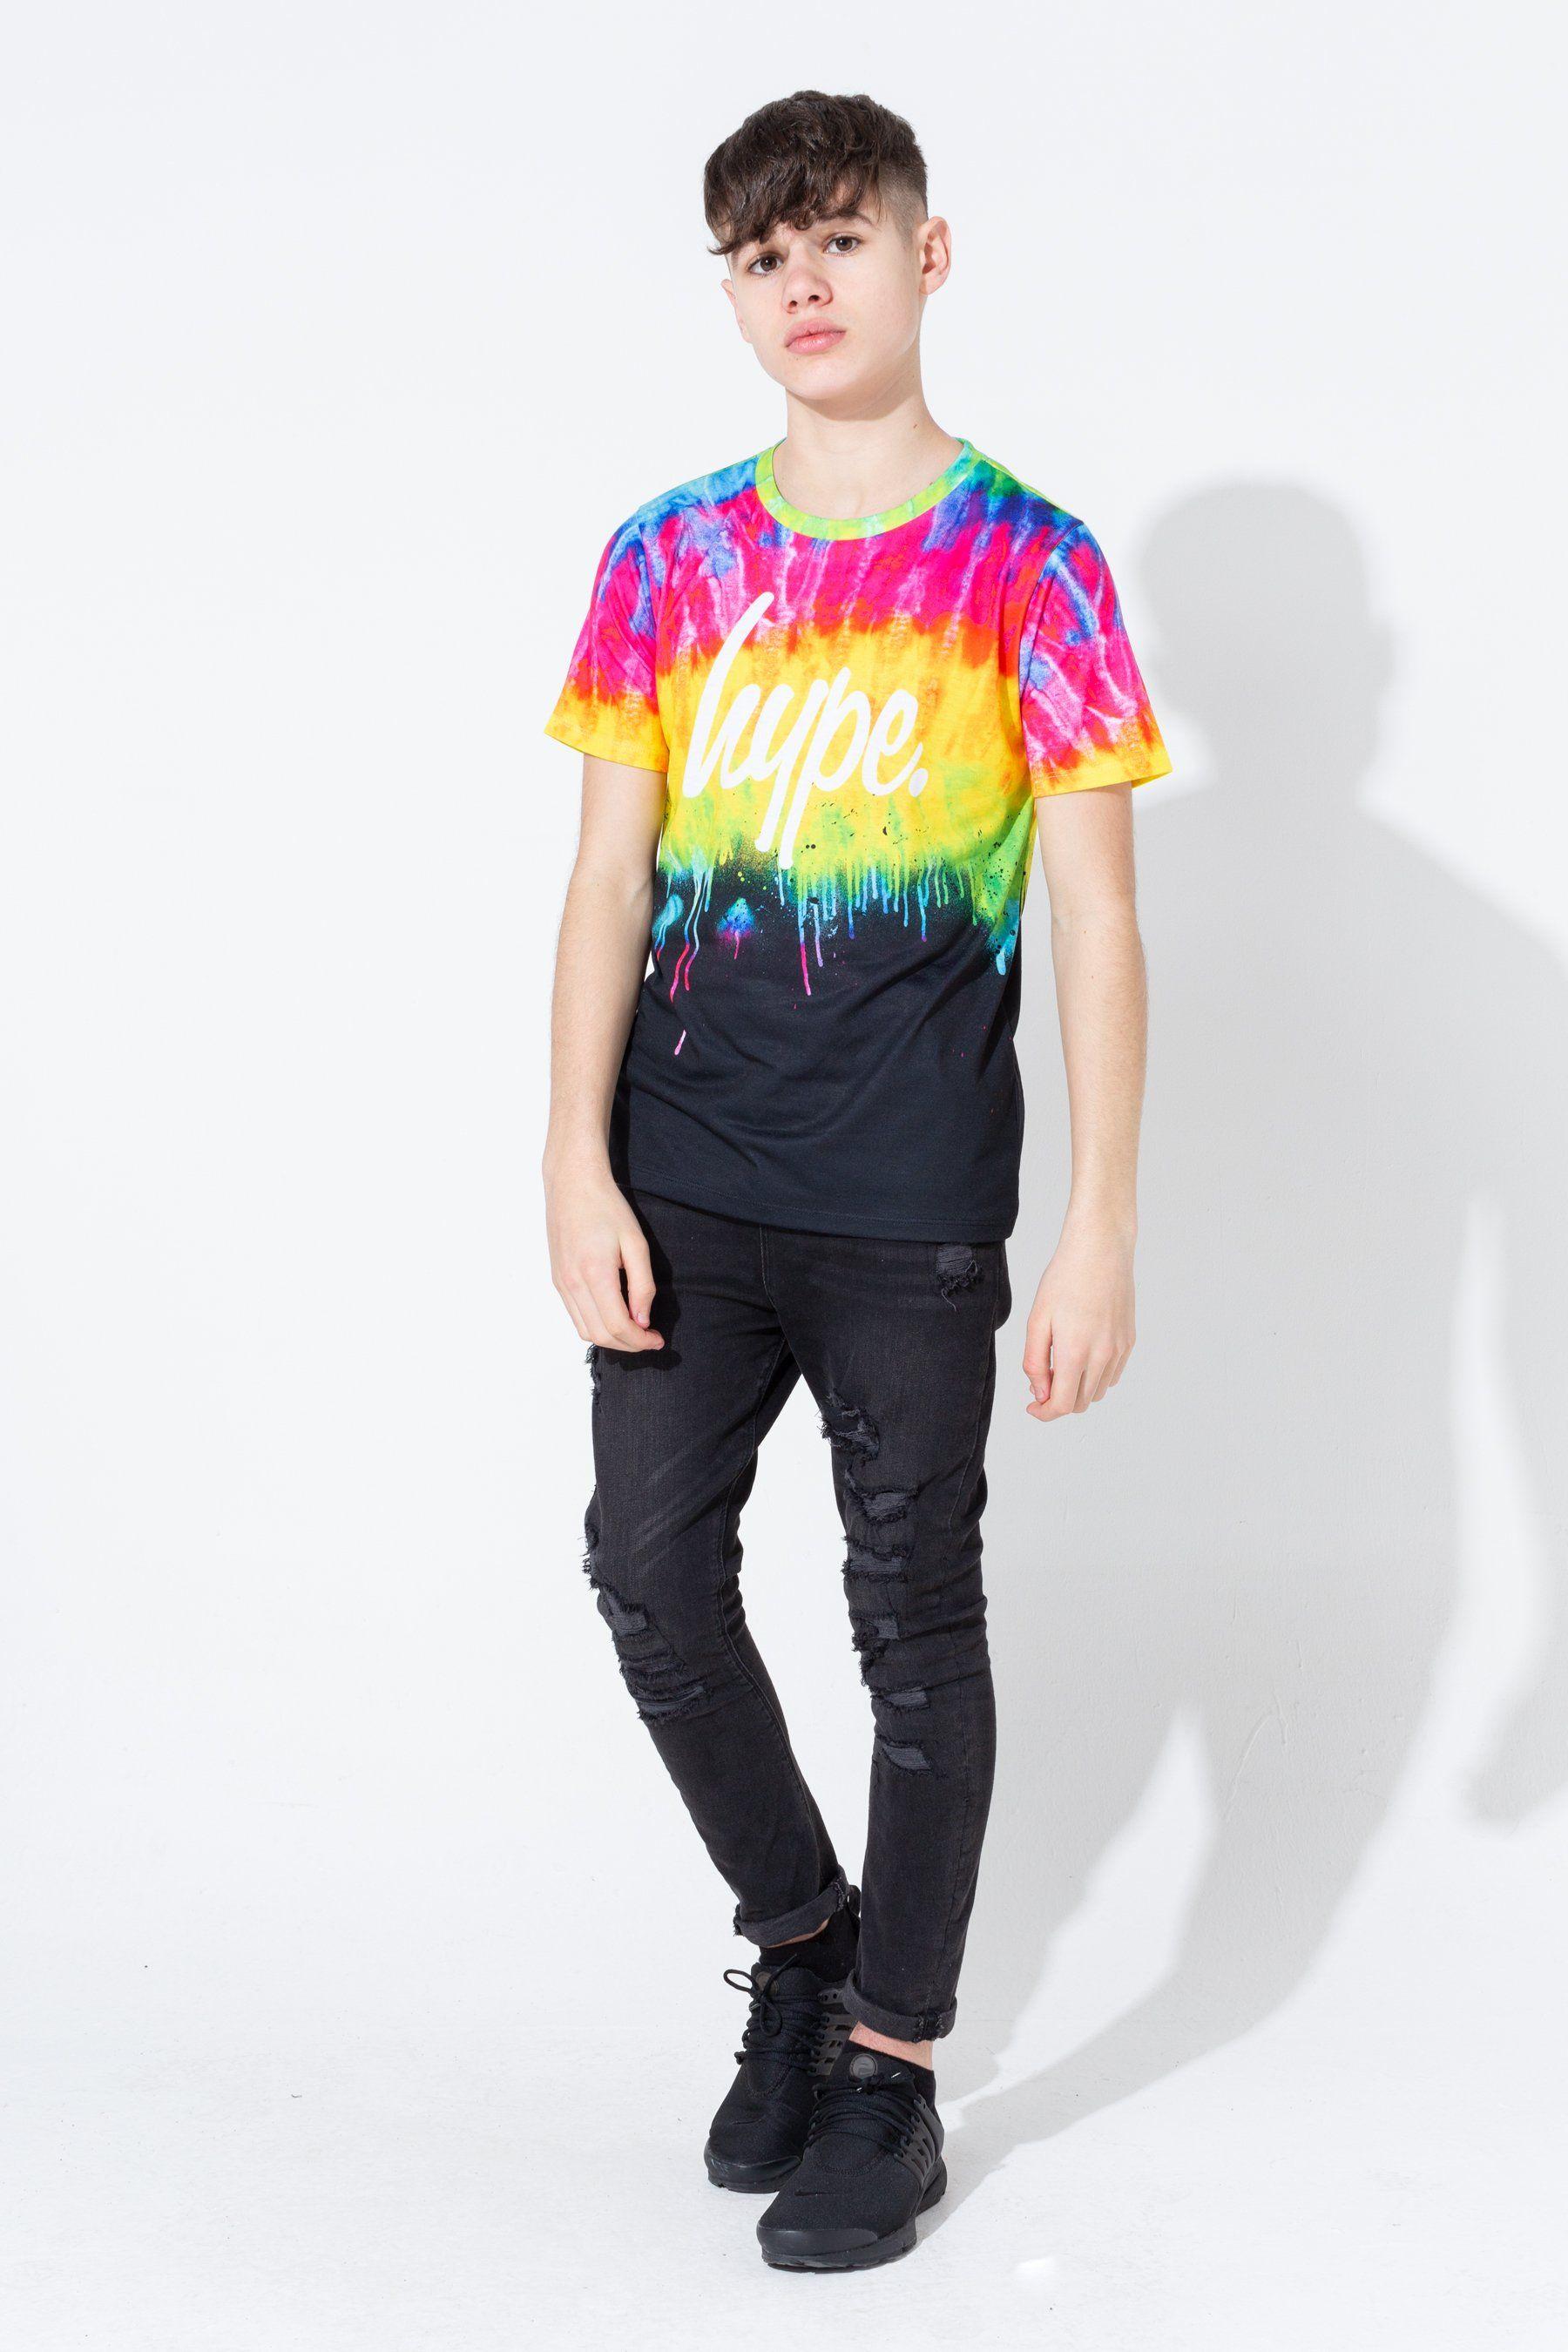 Hype Tie Dye Drips Kids T-Shirt